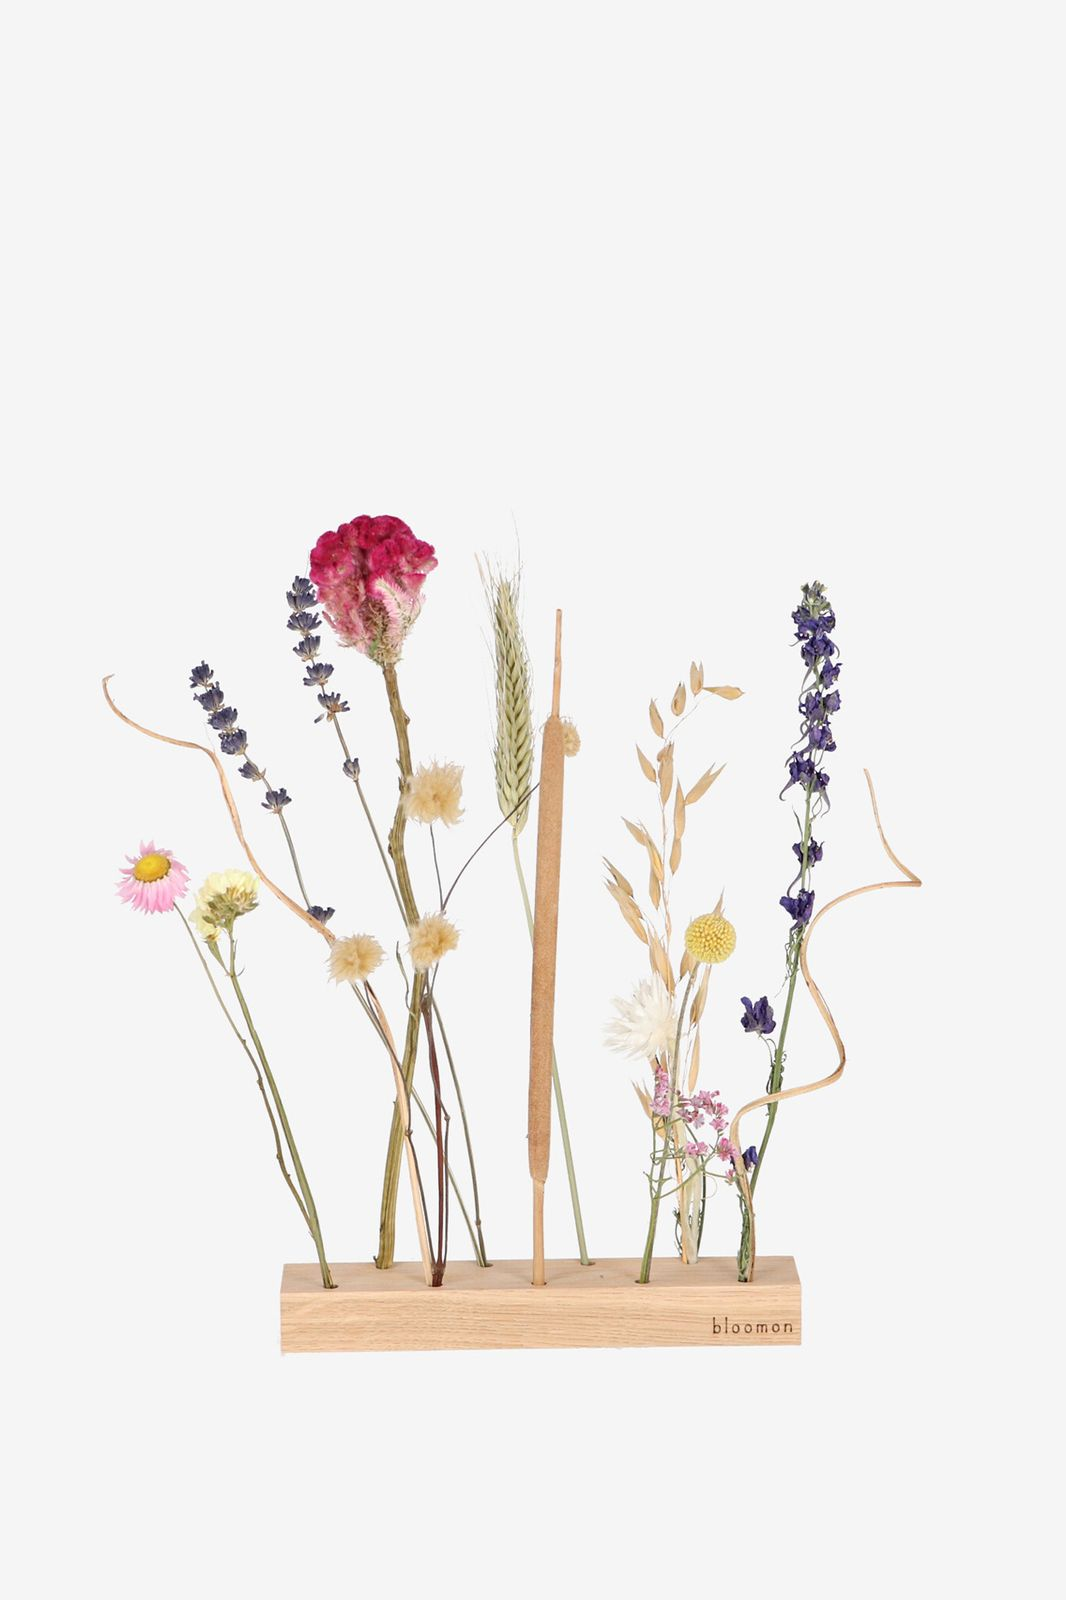 Bloomon droogbloemen picnic - Homeland | Sissy-Boy